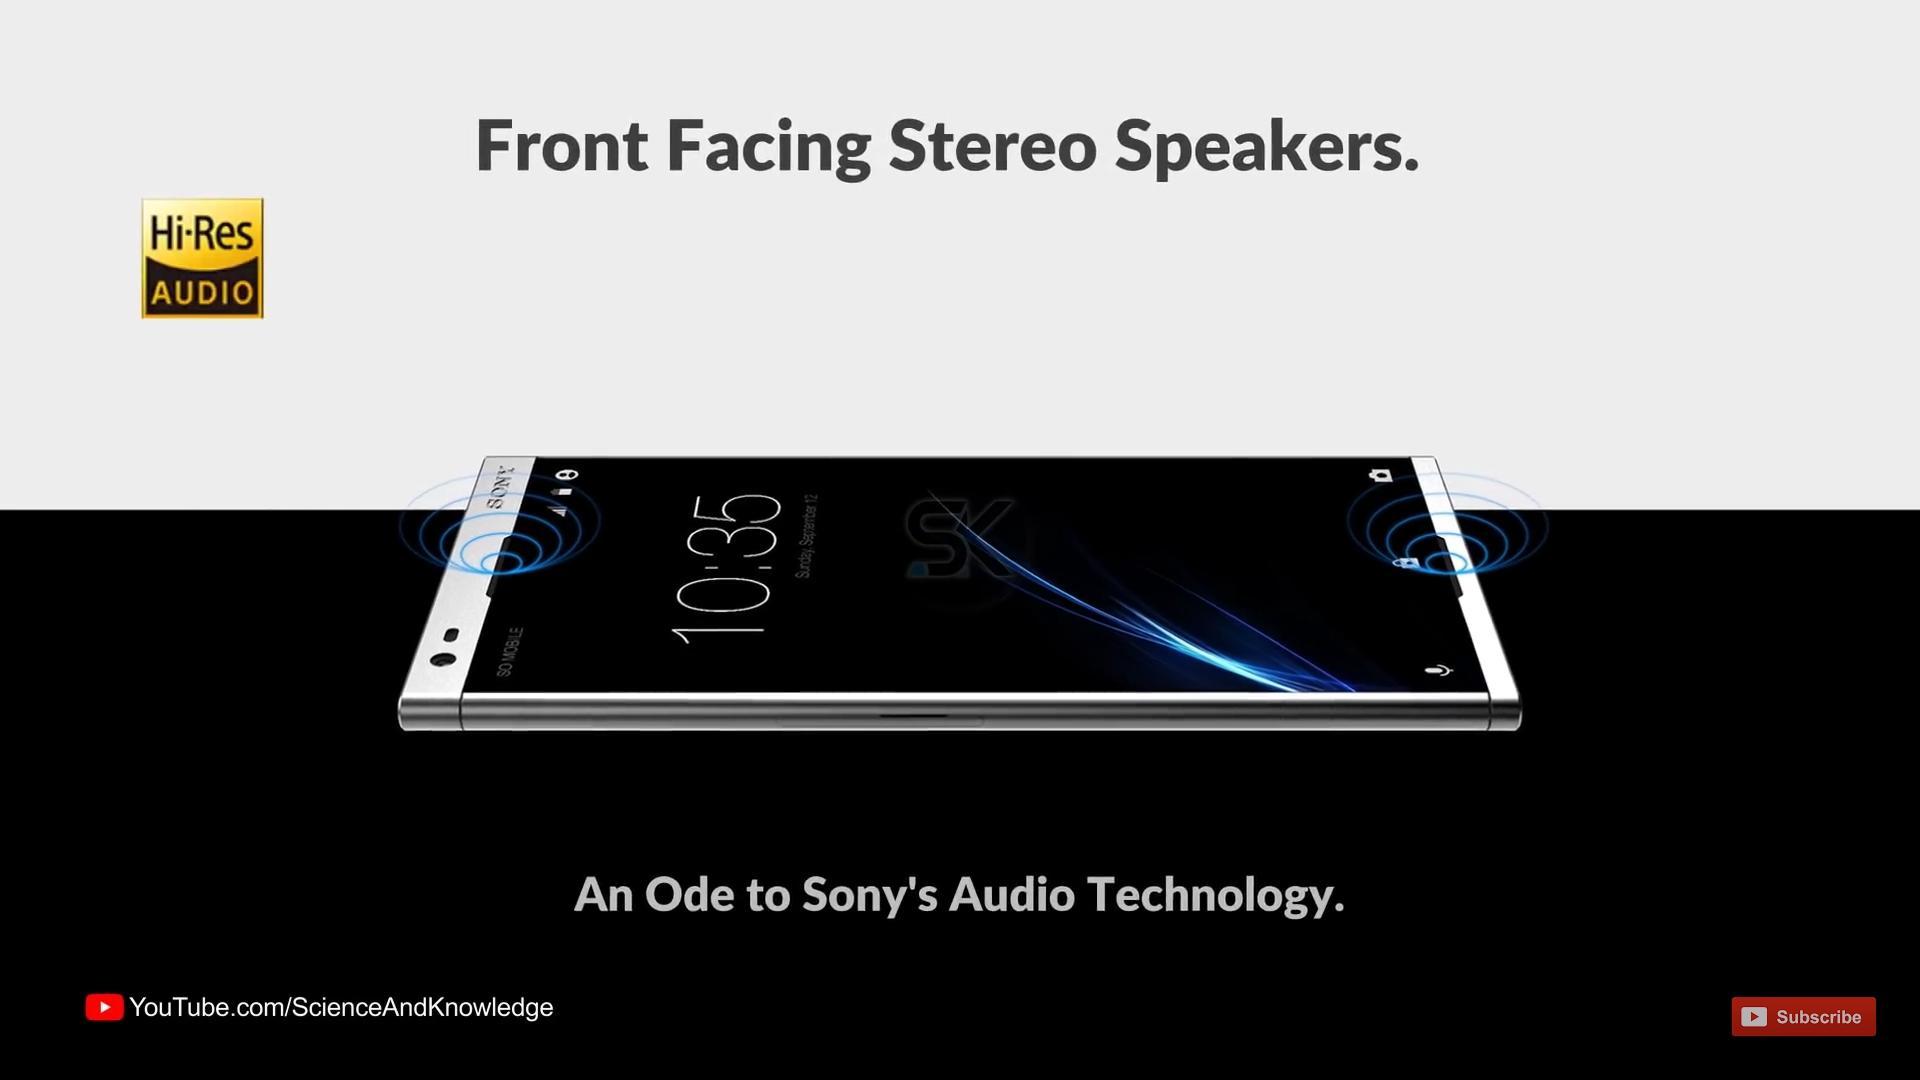 Diseño del Sony Xperia A